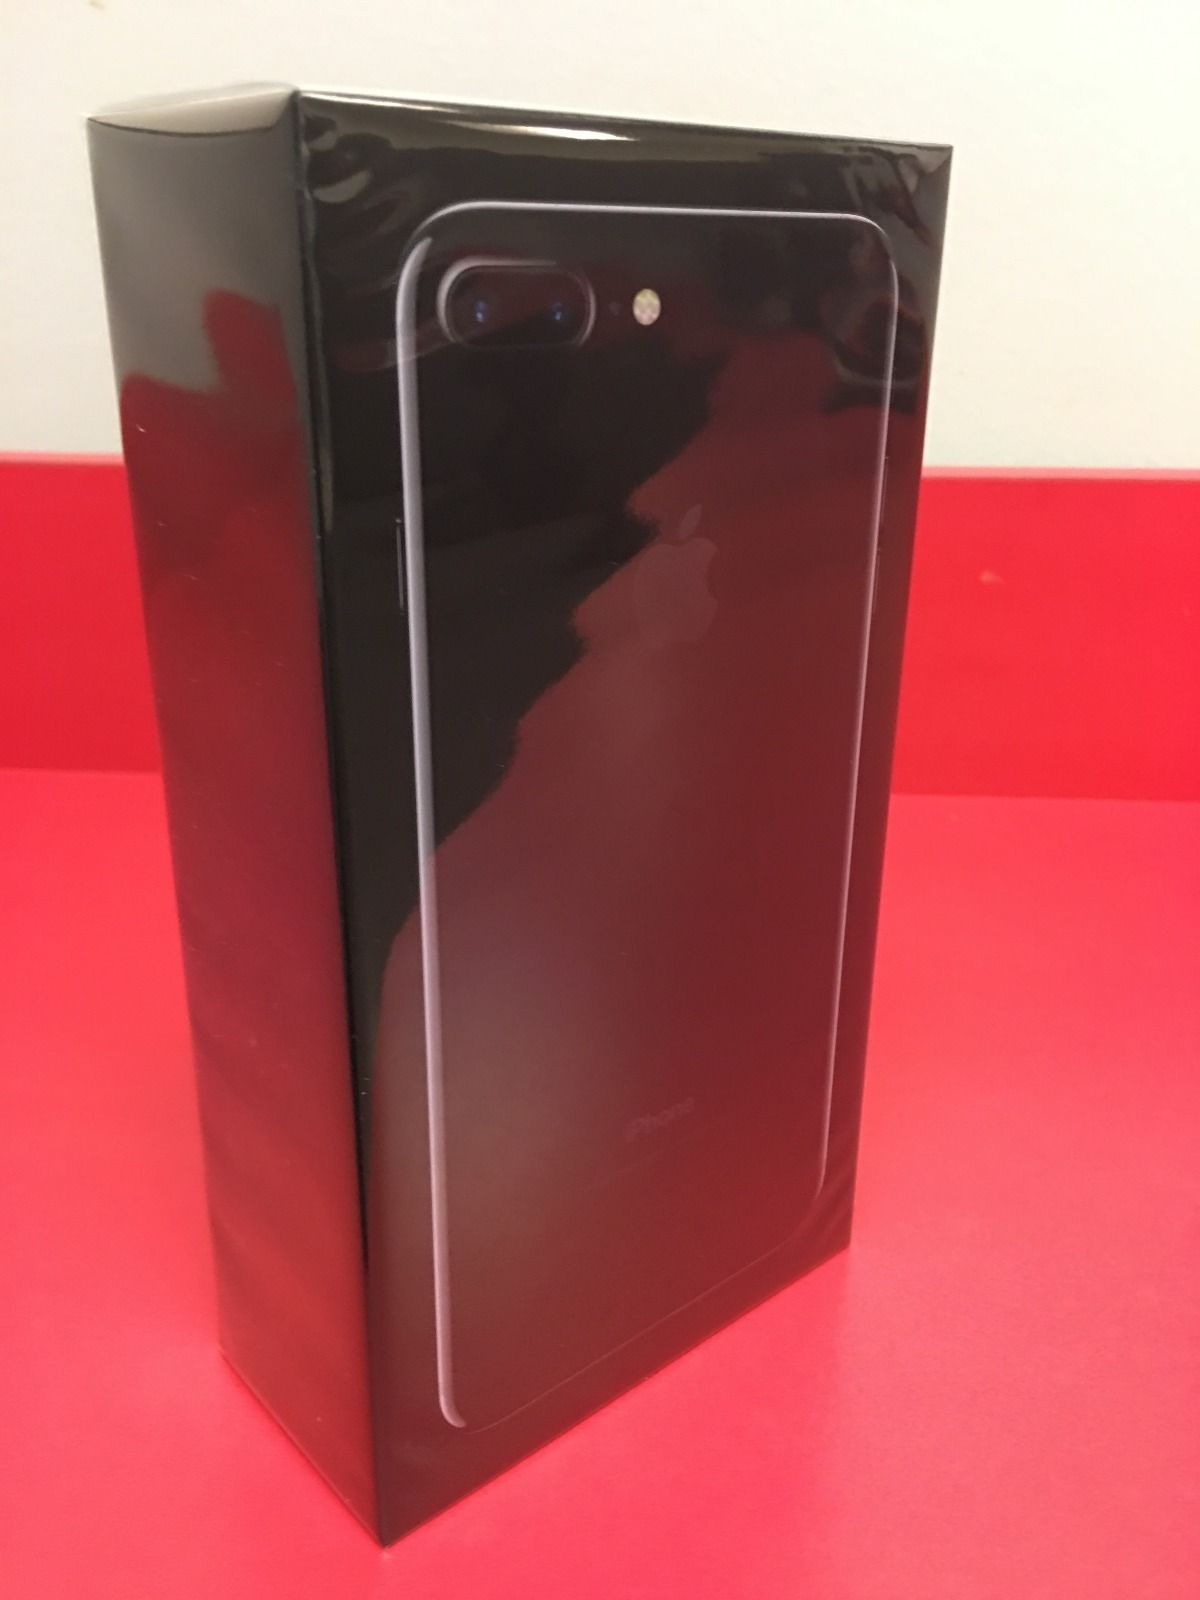 New Apple Iphone 7 Plus Latest Model 256gb Jet Black Att Jetblack Unlocked